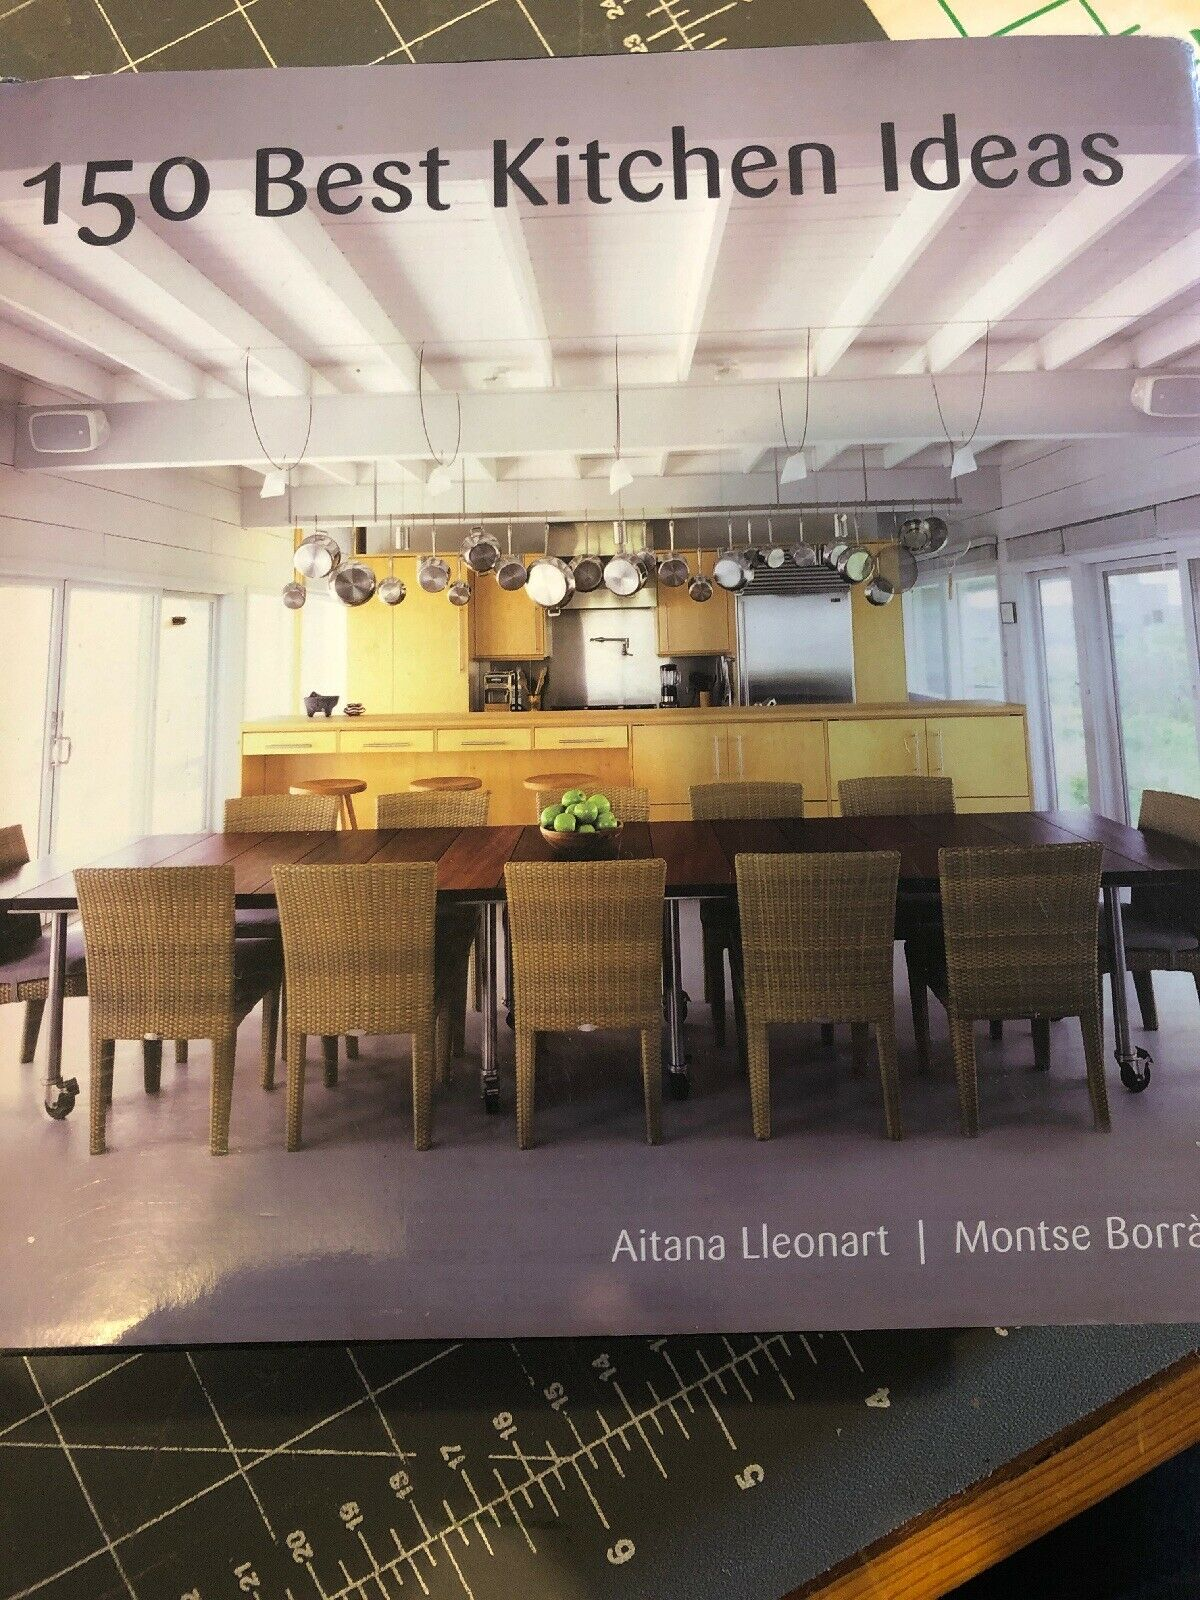 150 Best Kitchen Ideas By Aitana Lleonart Montse Borràs And Montse Borràs 2009 Hardcover For Sale Online Ebay